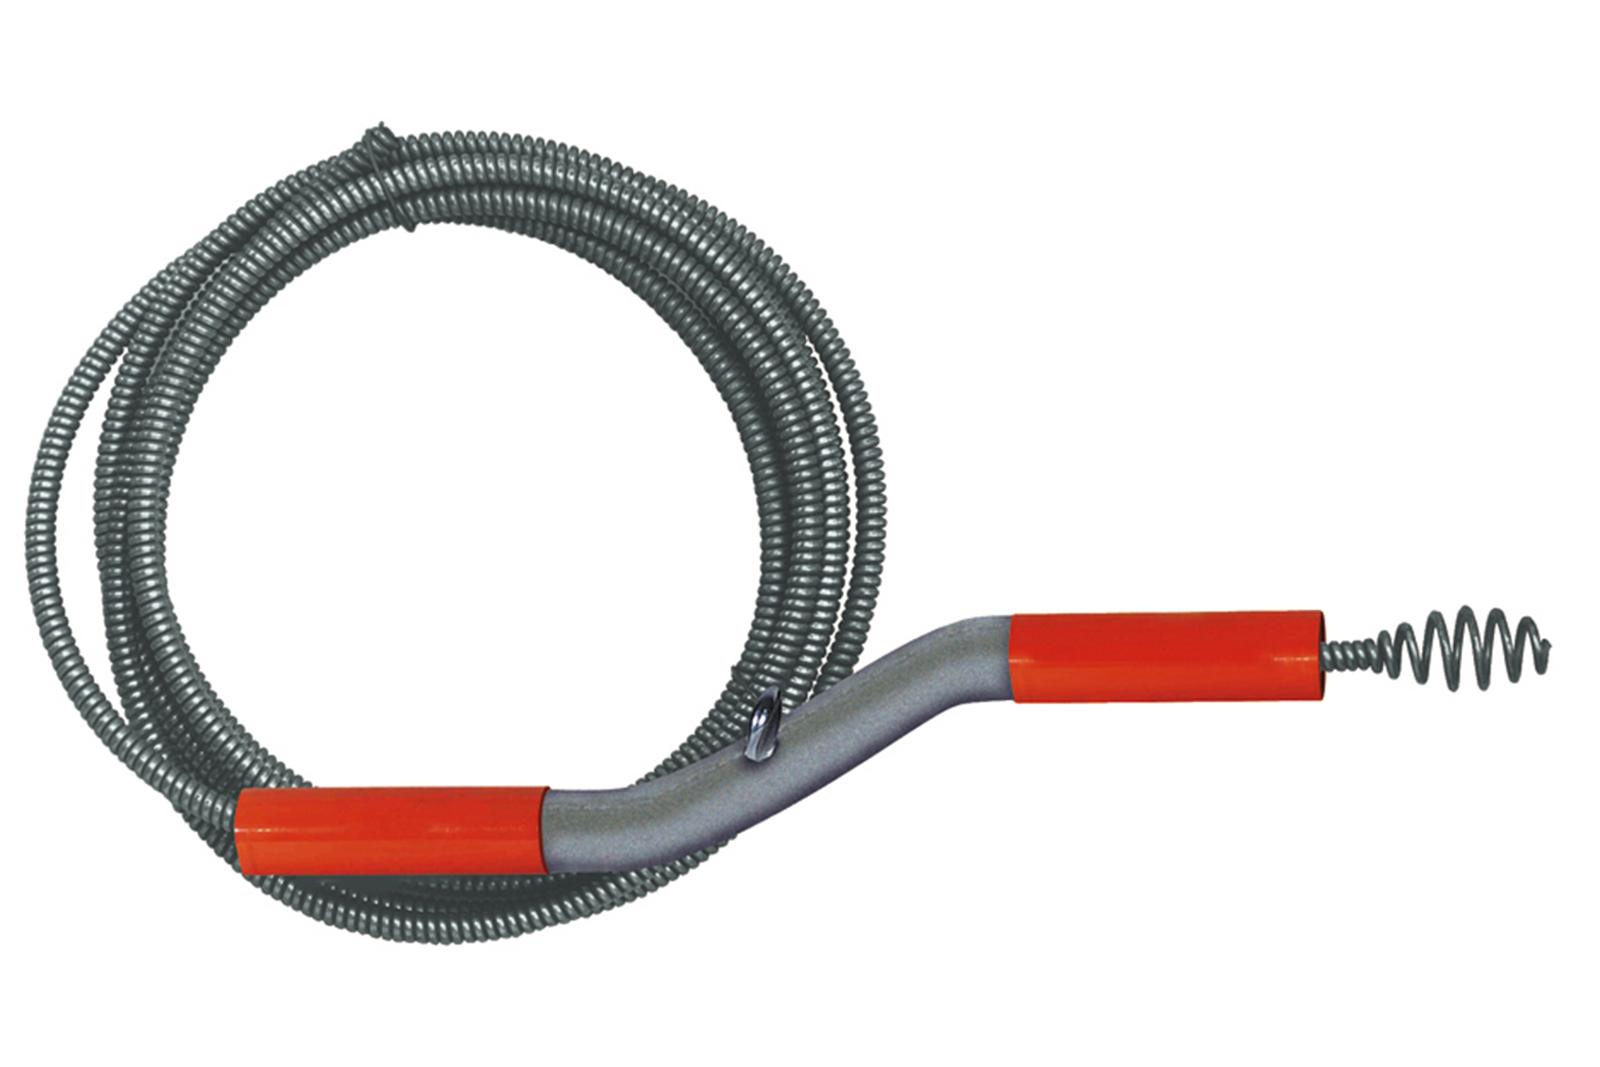 Купить Трос для прочистки General pipe Flexicore 25fl2